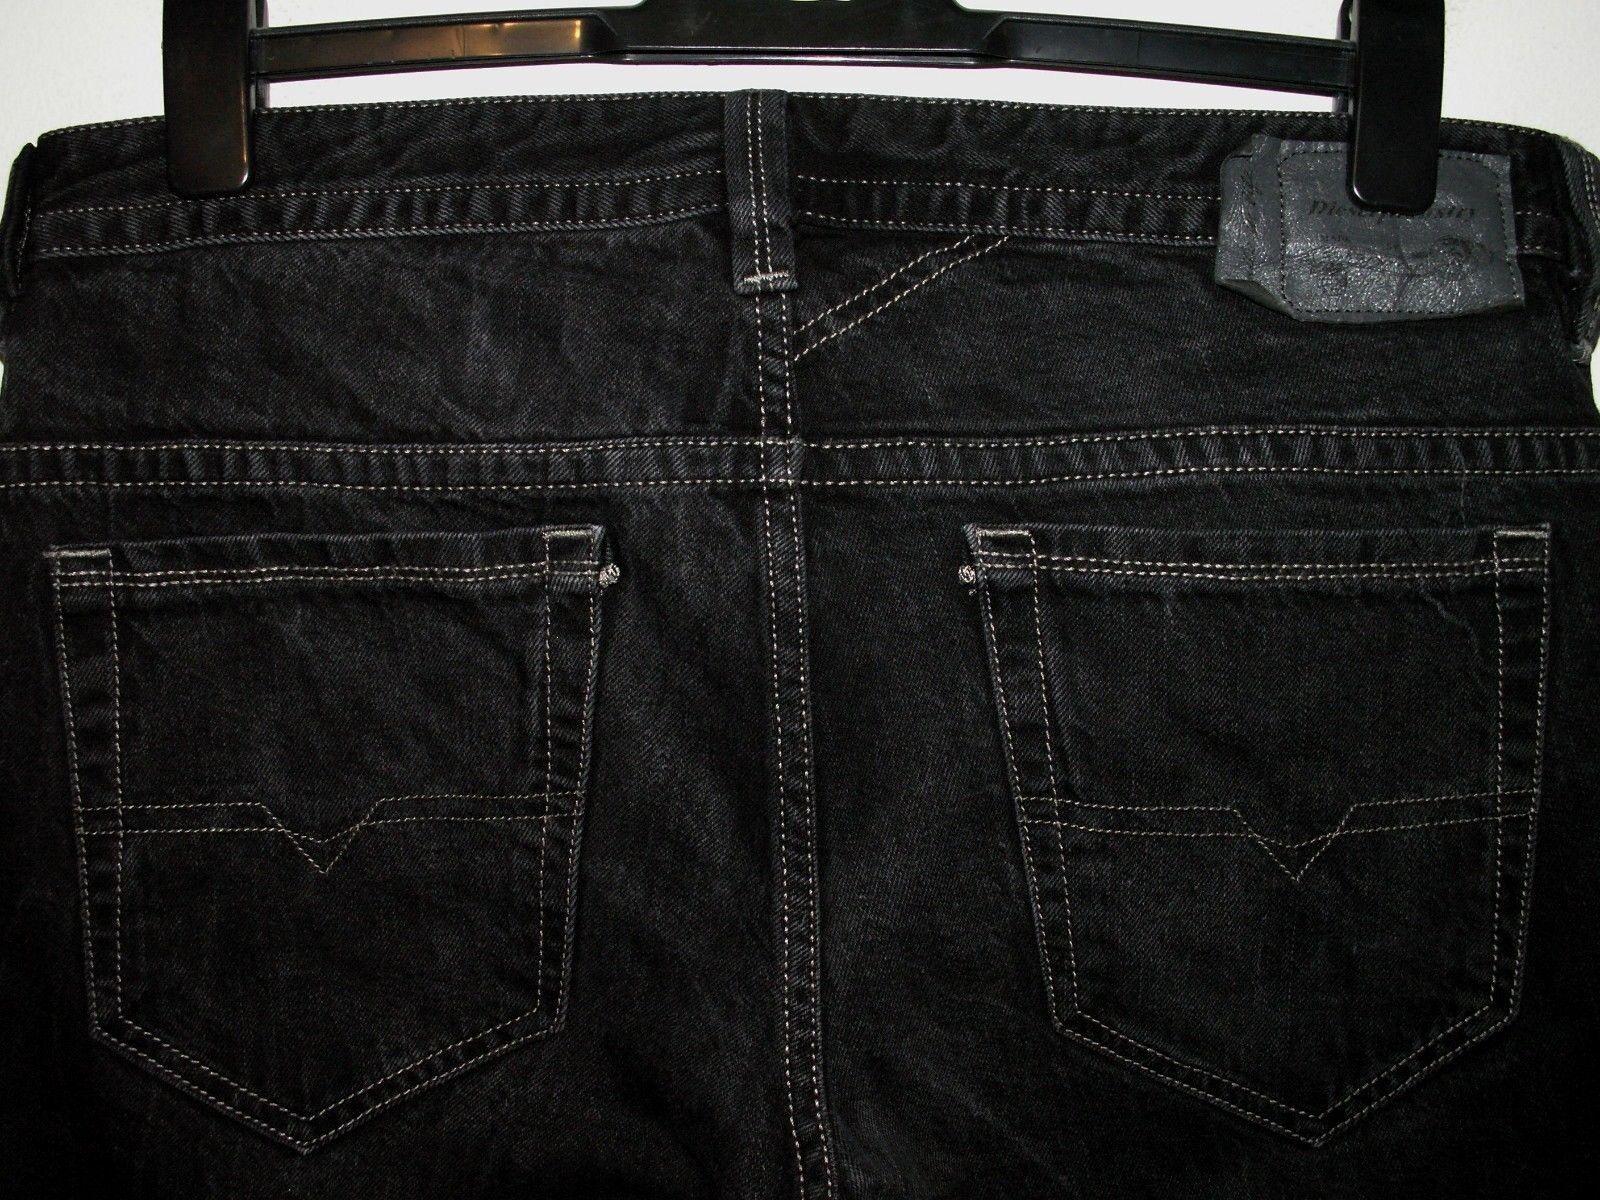 DIESEL THAVAR SLIM-SKINNY FIT JEANS 0RL40 W32 L32 (5130)     | Primäre Qualität  |   | Komfort